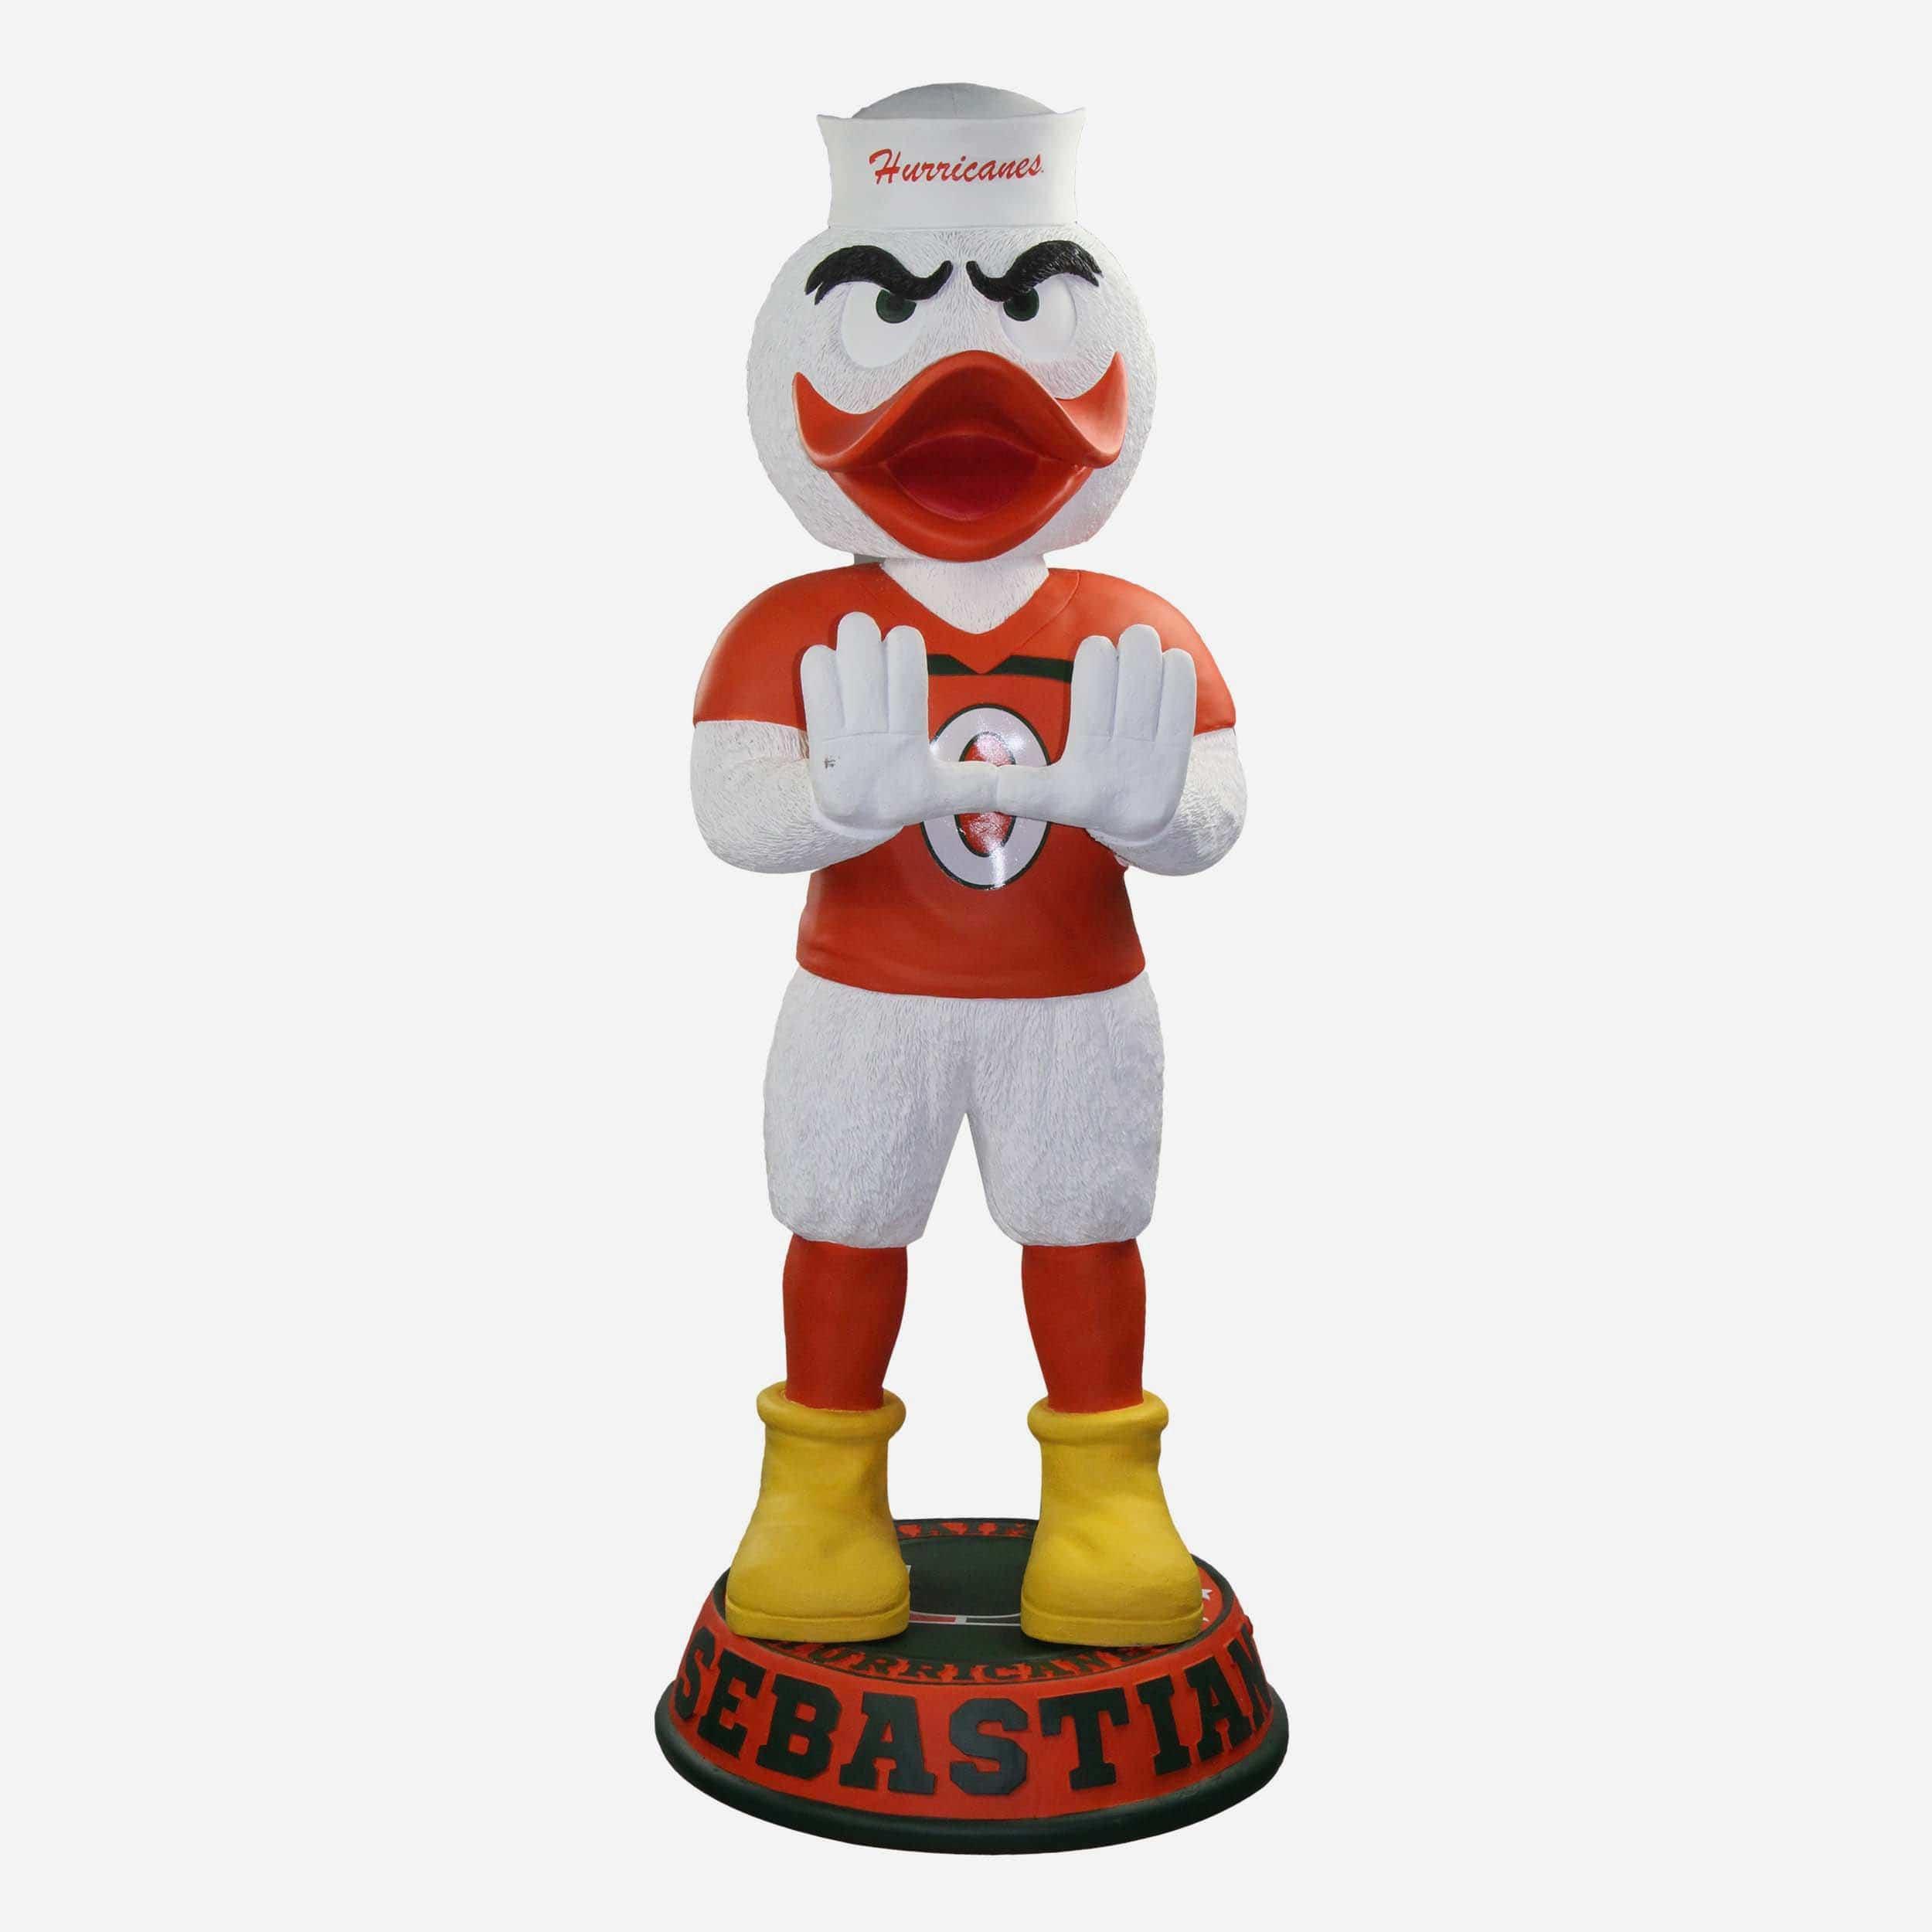 FOCO Sebastian Miami Hurricanes Orange Jersey 3 Ft Mascot Bobblehead